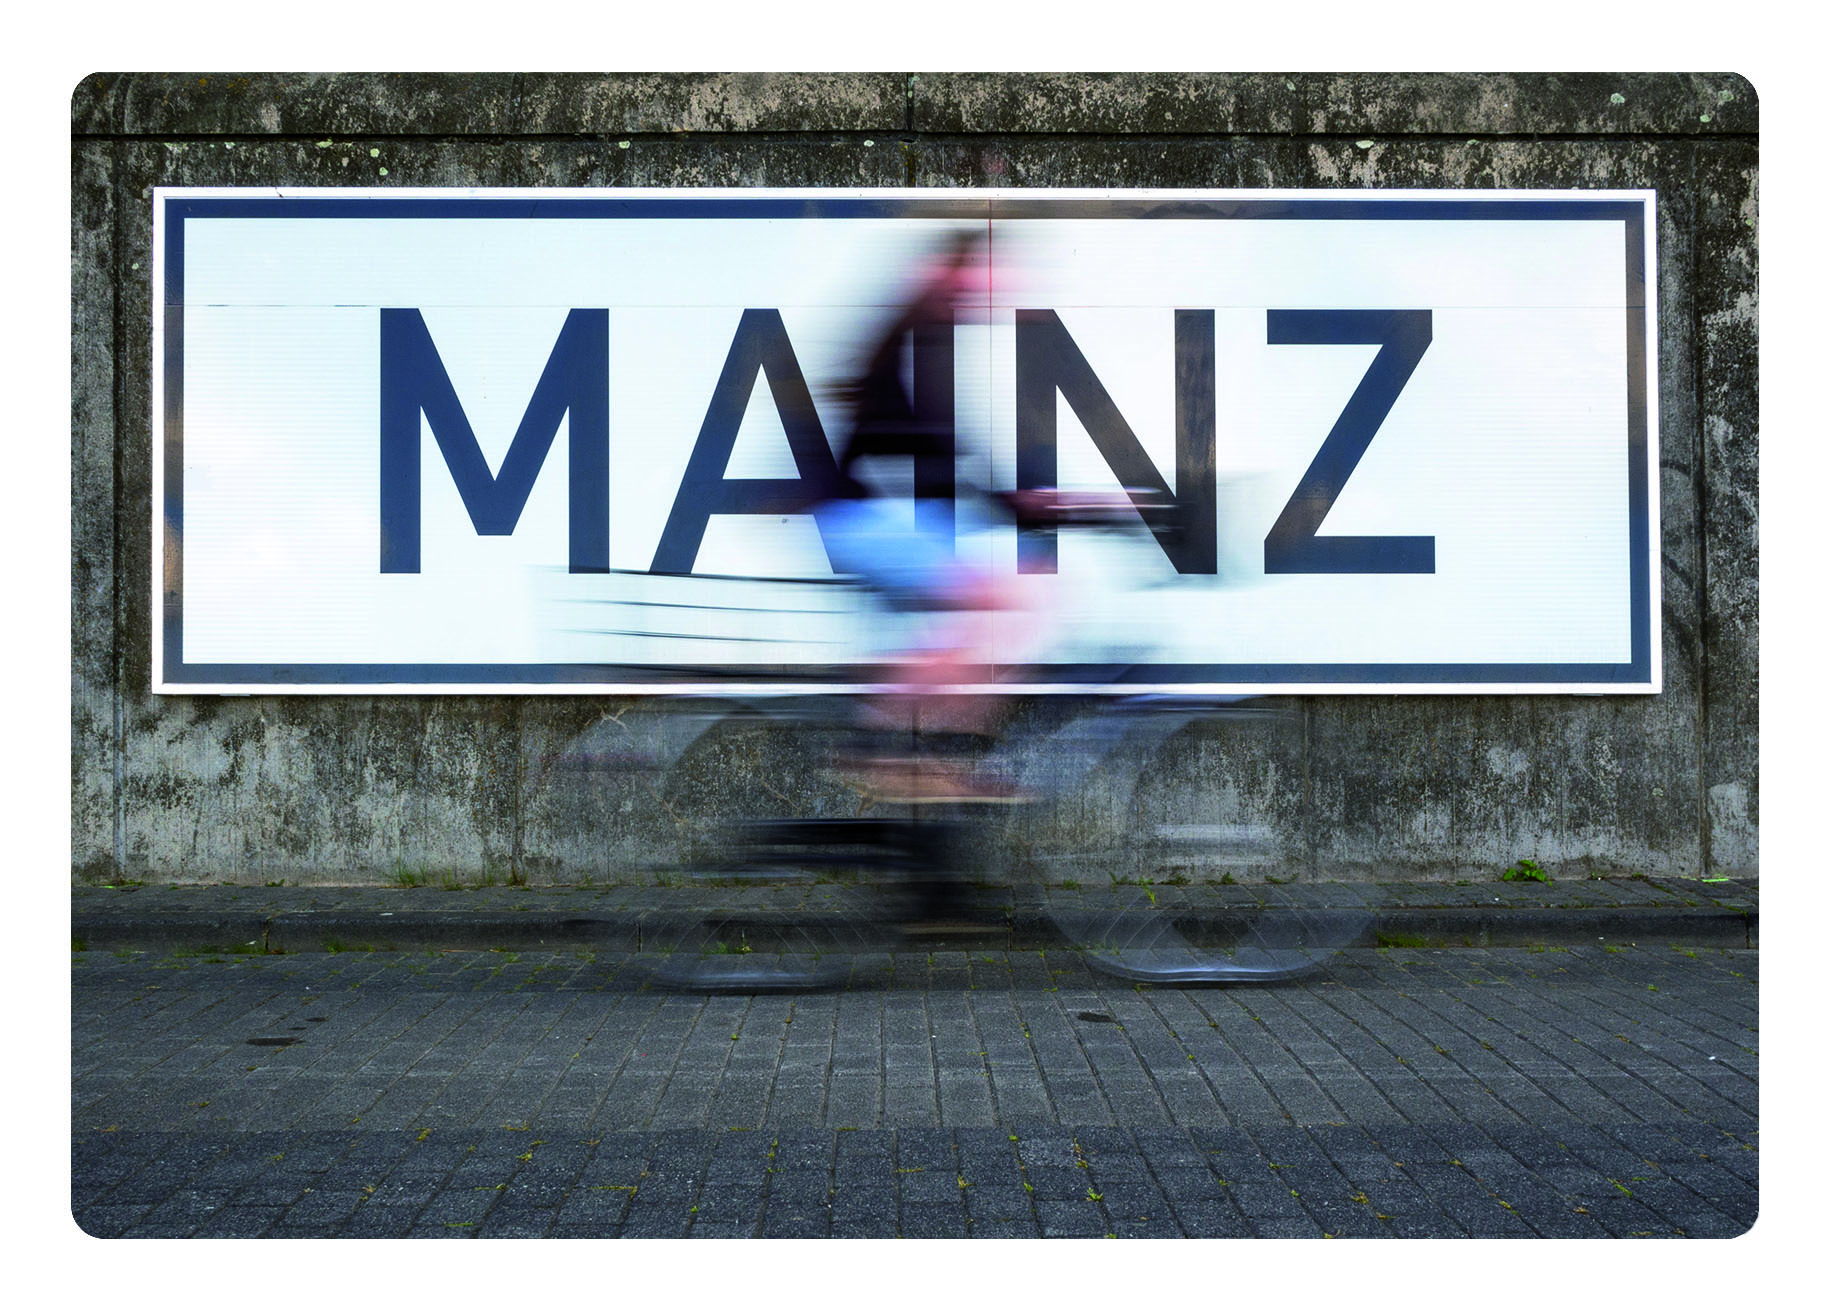 querformat-fotografie - Achim Katzberg - 07_1 Postkarten_Mainz_MAINZ